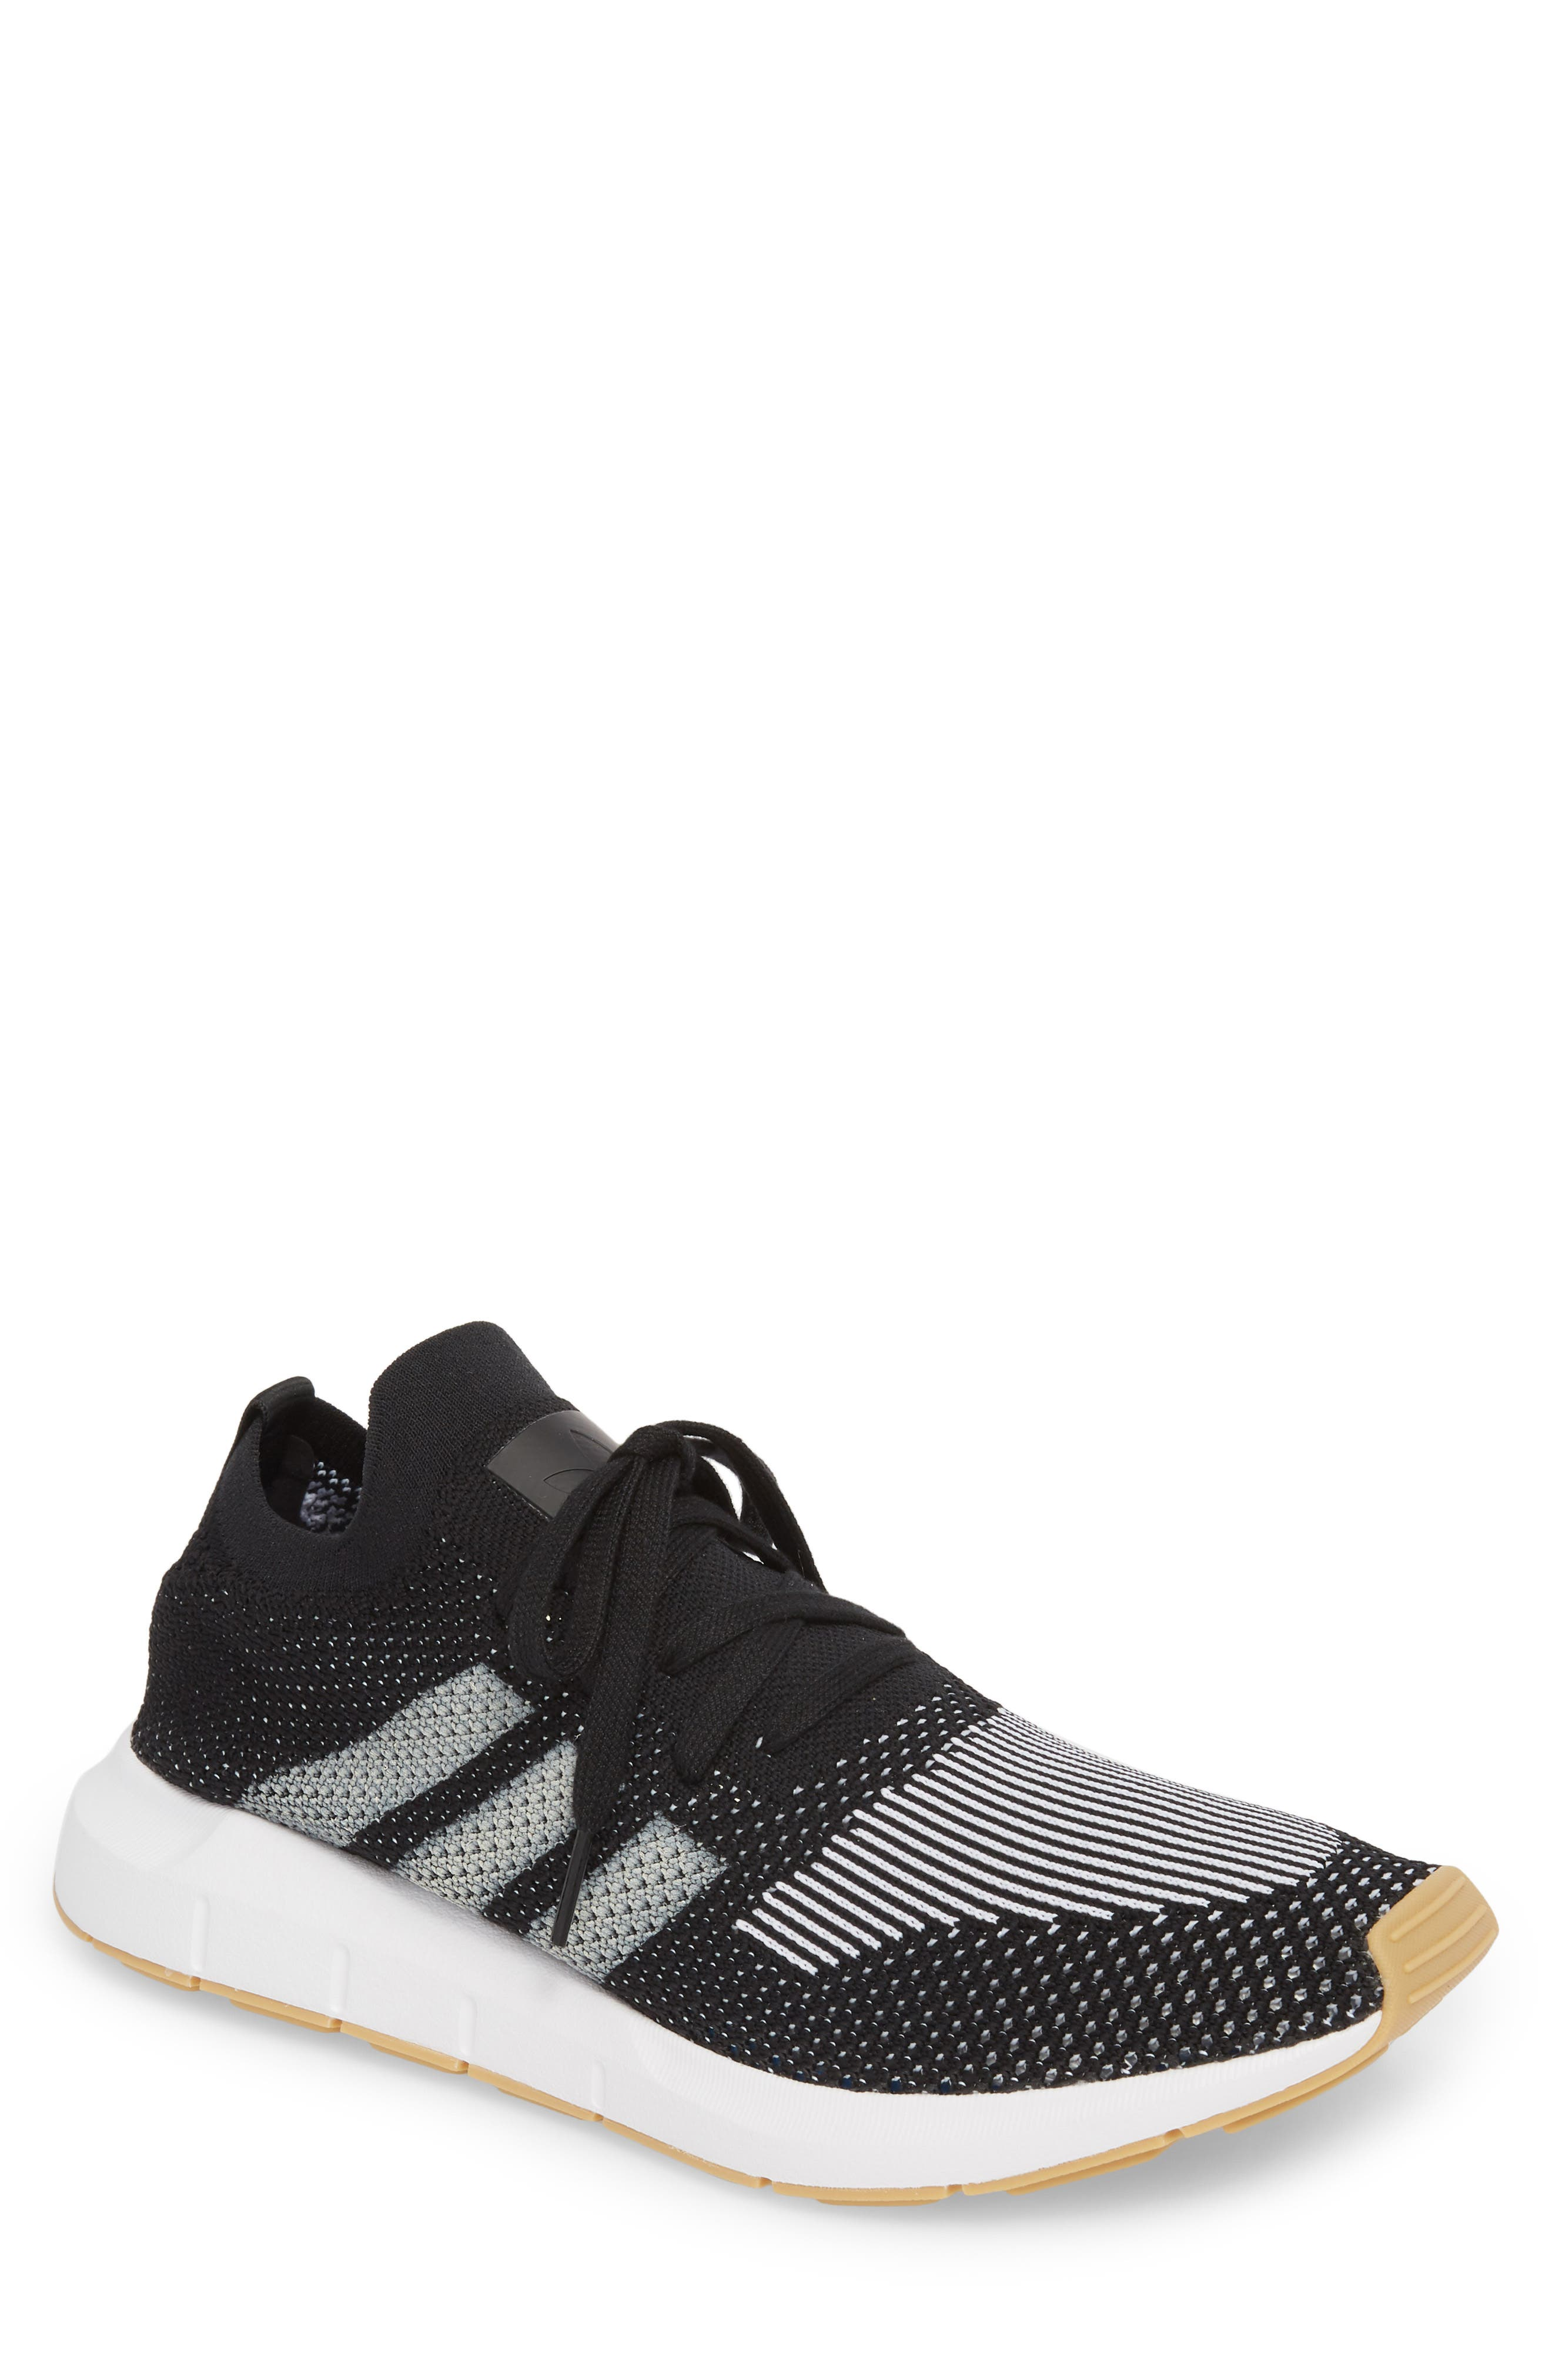 Swift Run Primeknit Sneaker,                         Main,                         color, 001